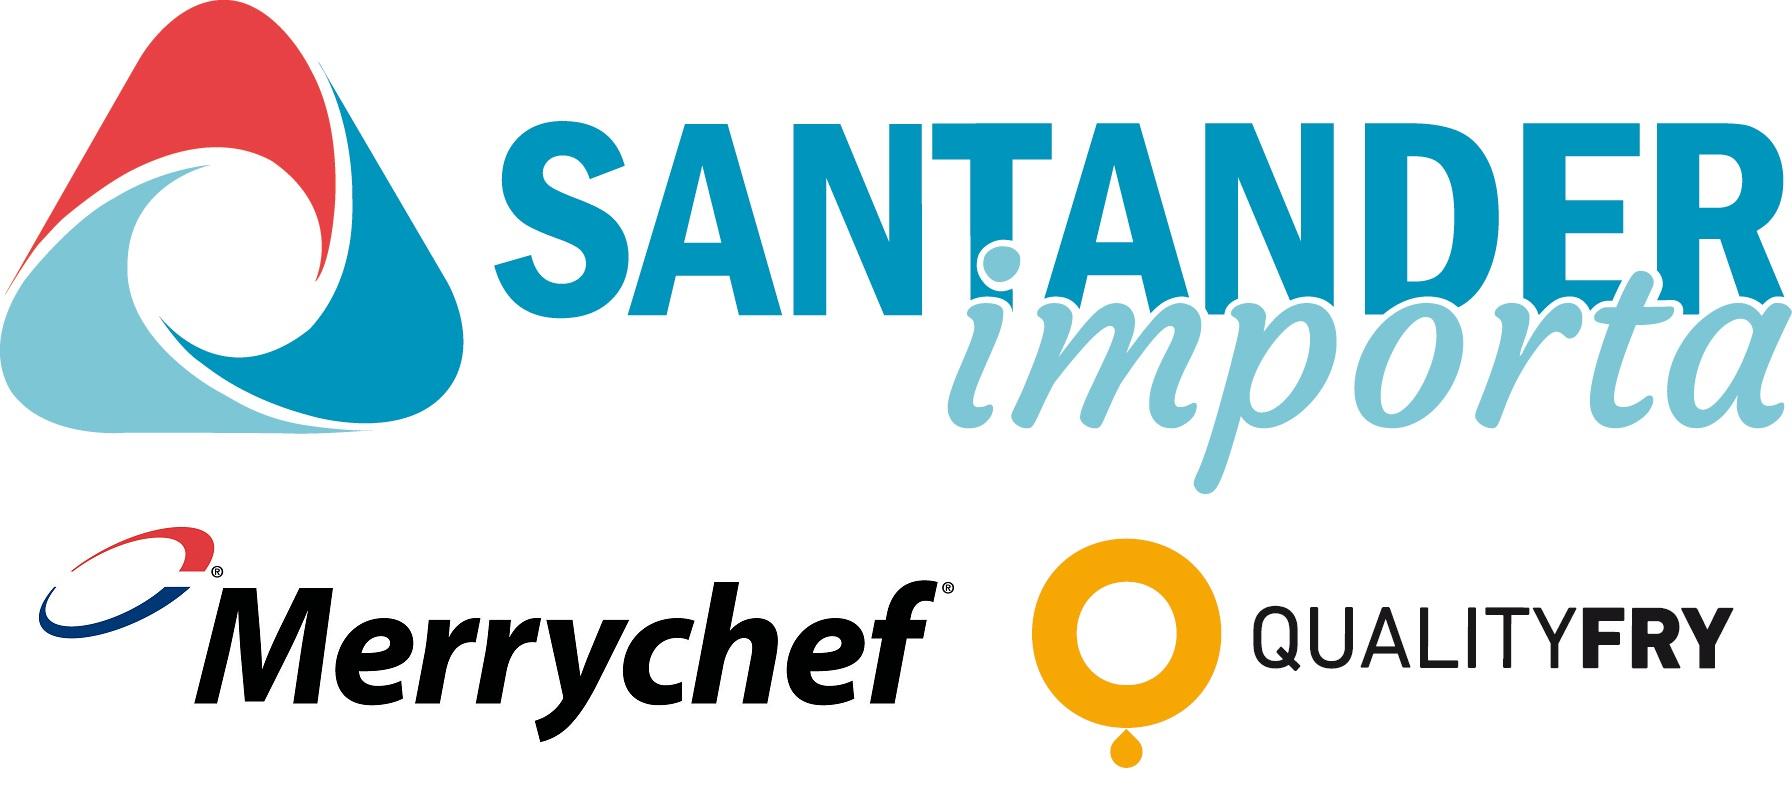 Santander Importa - Merrychef - Quality